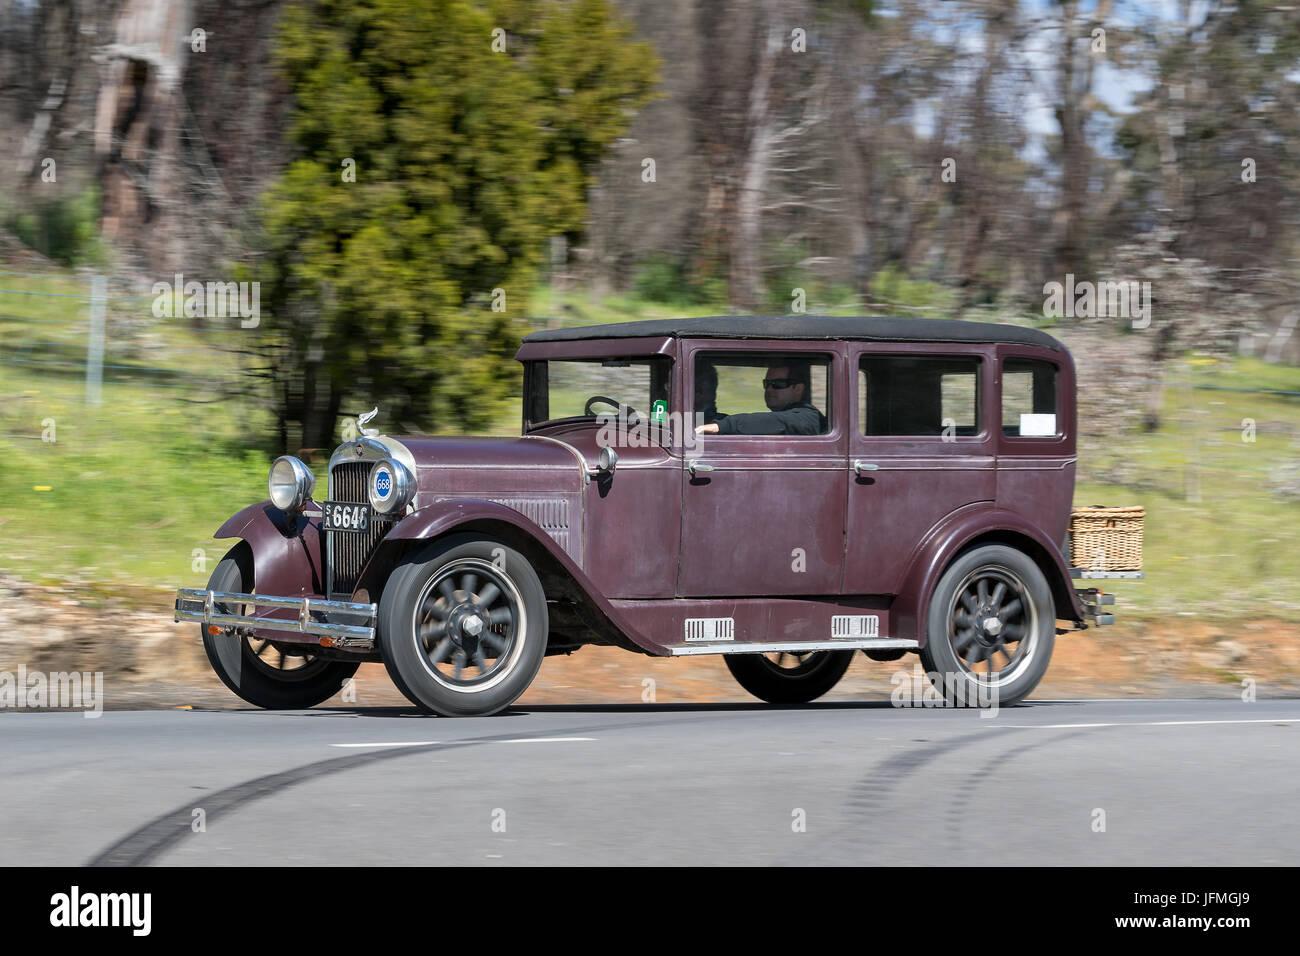 Vintage 1929 Essex Super Six Sedan driving on country roads